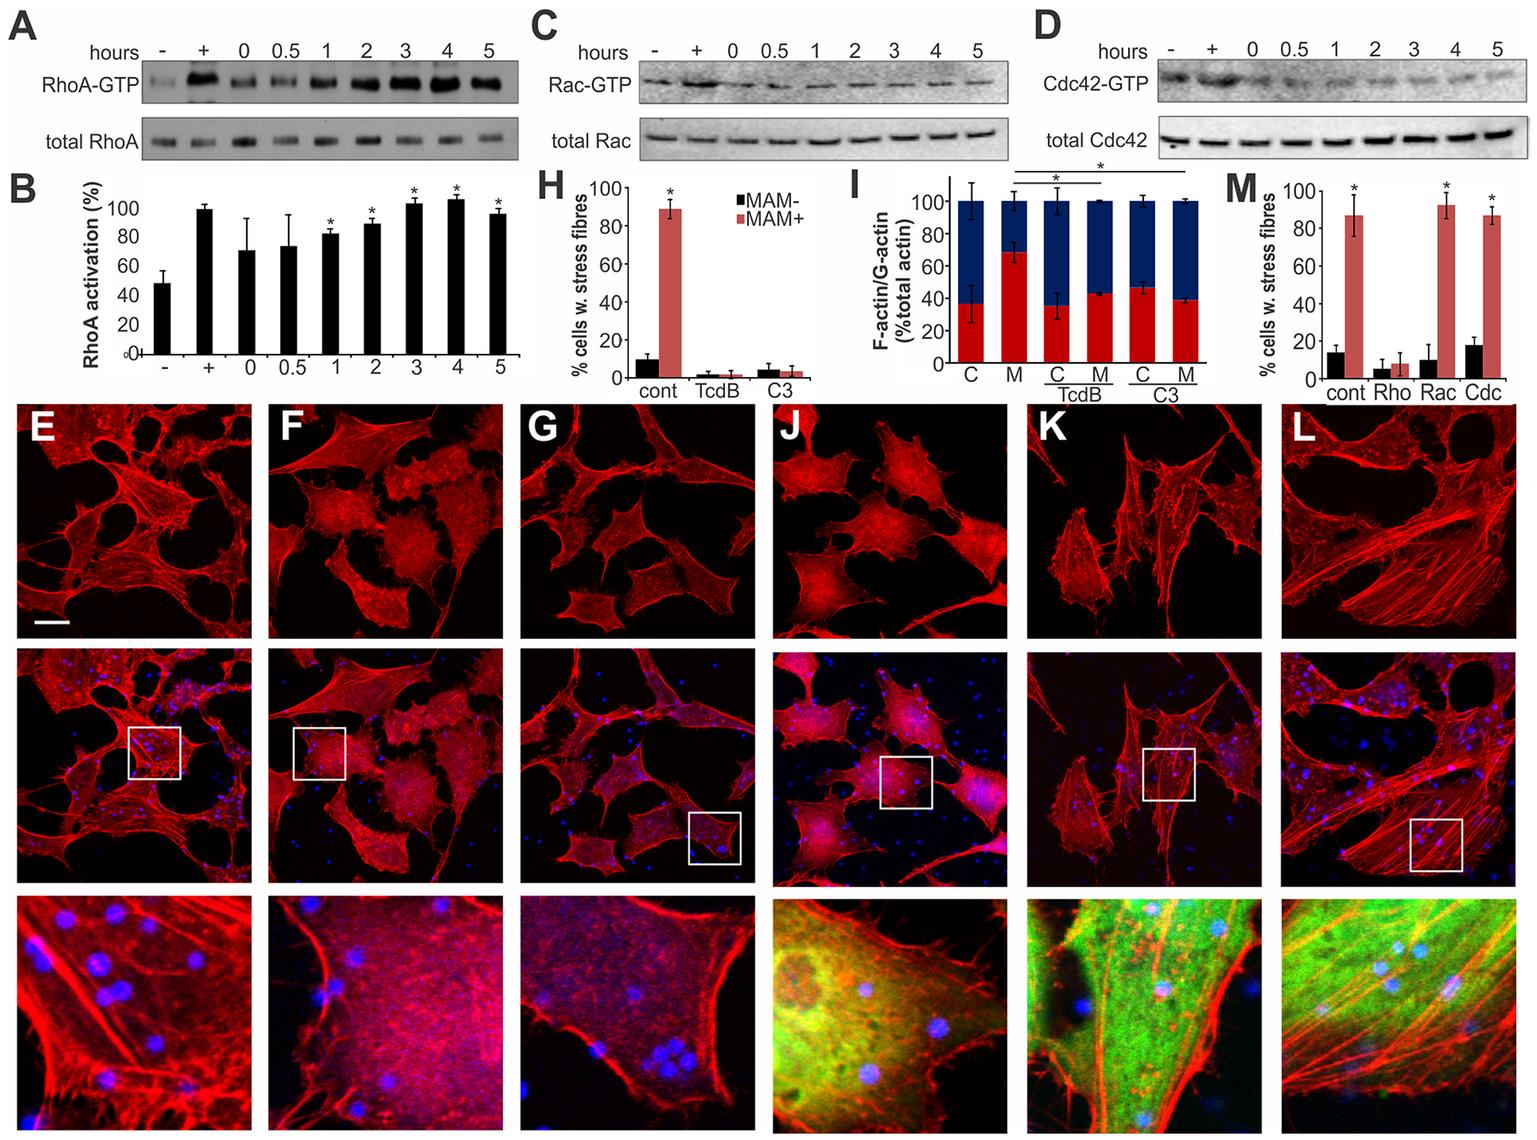 Clustered MAM7 triggeres actin rearrangements through RhoA activation.